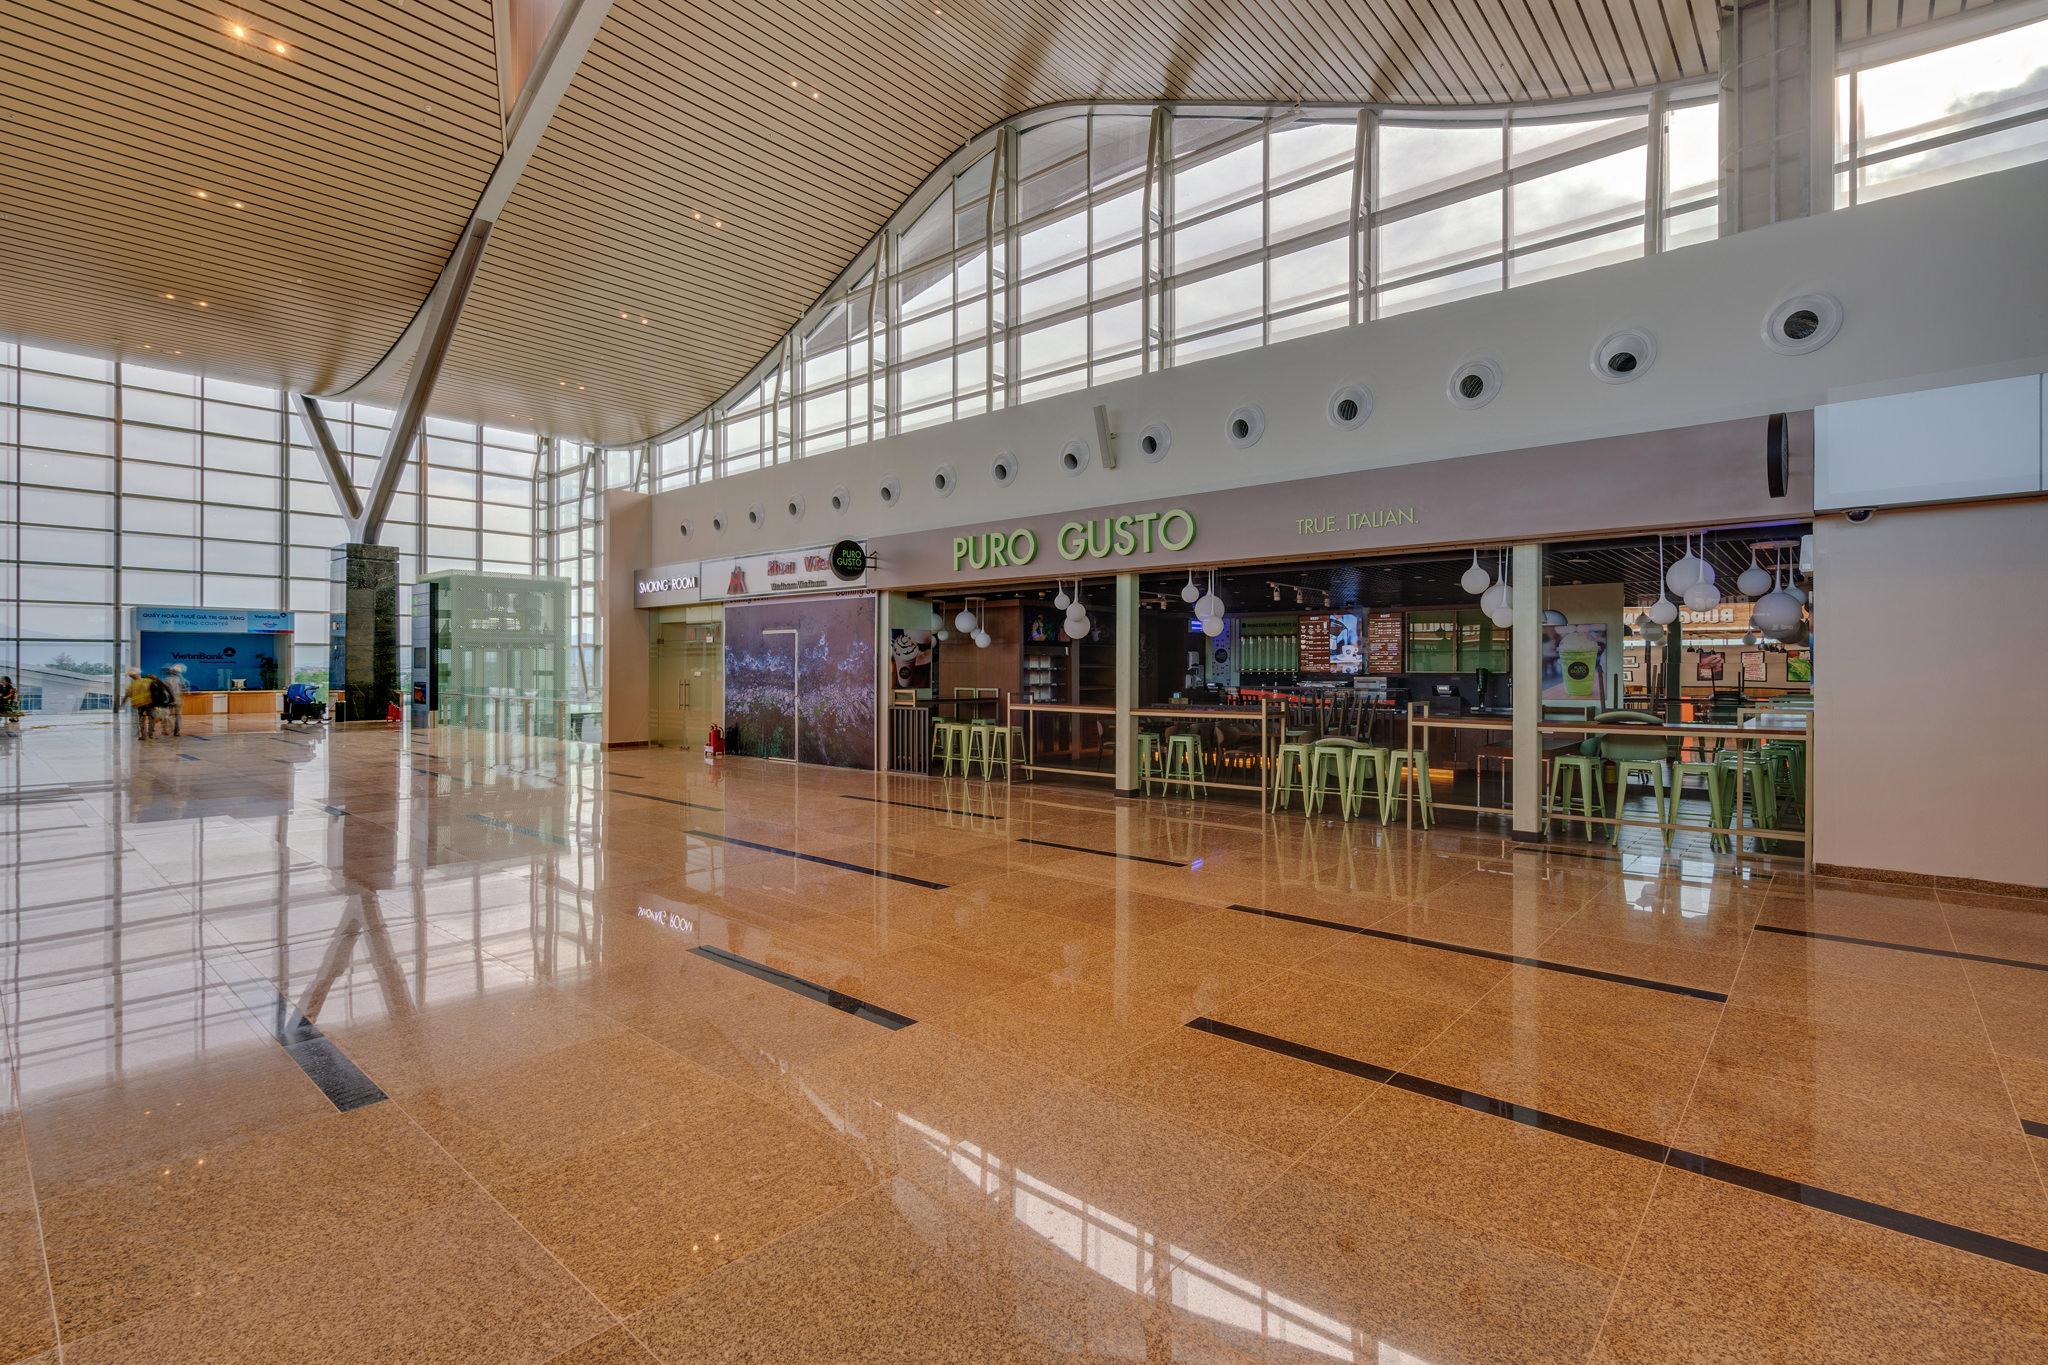 20180626 - Cam Ranh Airport - Architecture - 0343.jpg